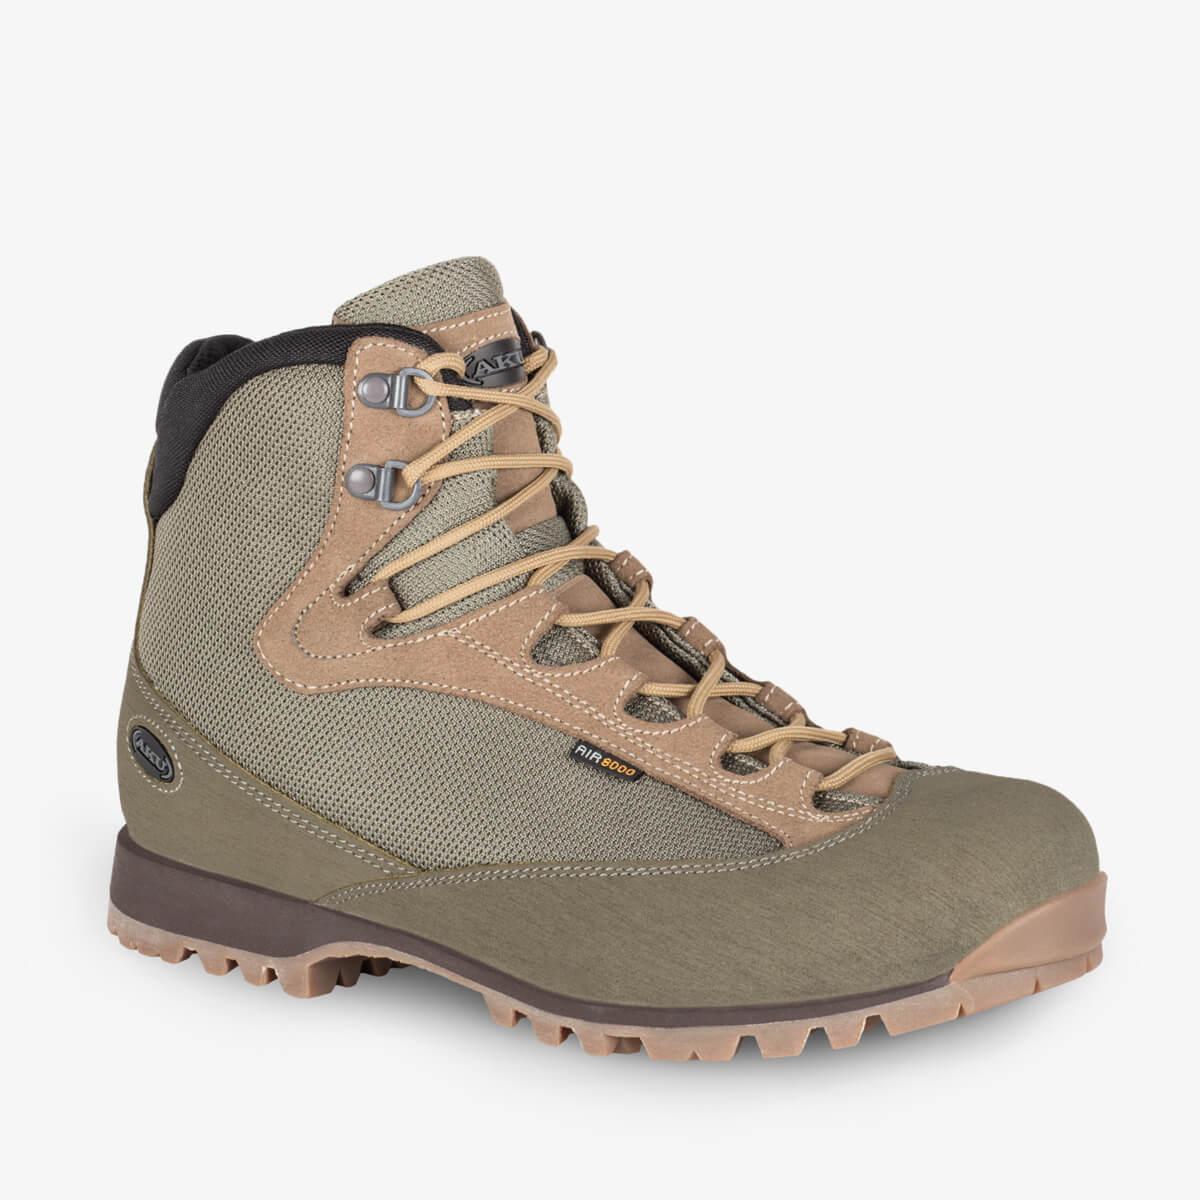 866f36c499a Products | Aku Tactical